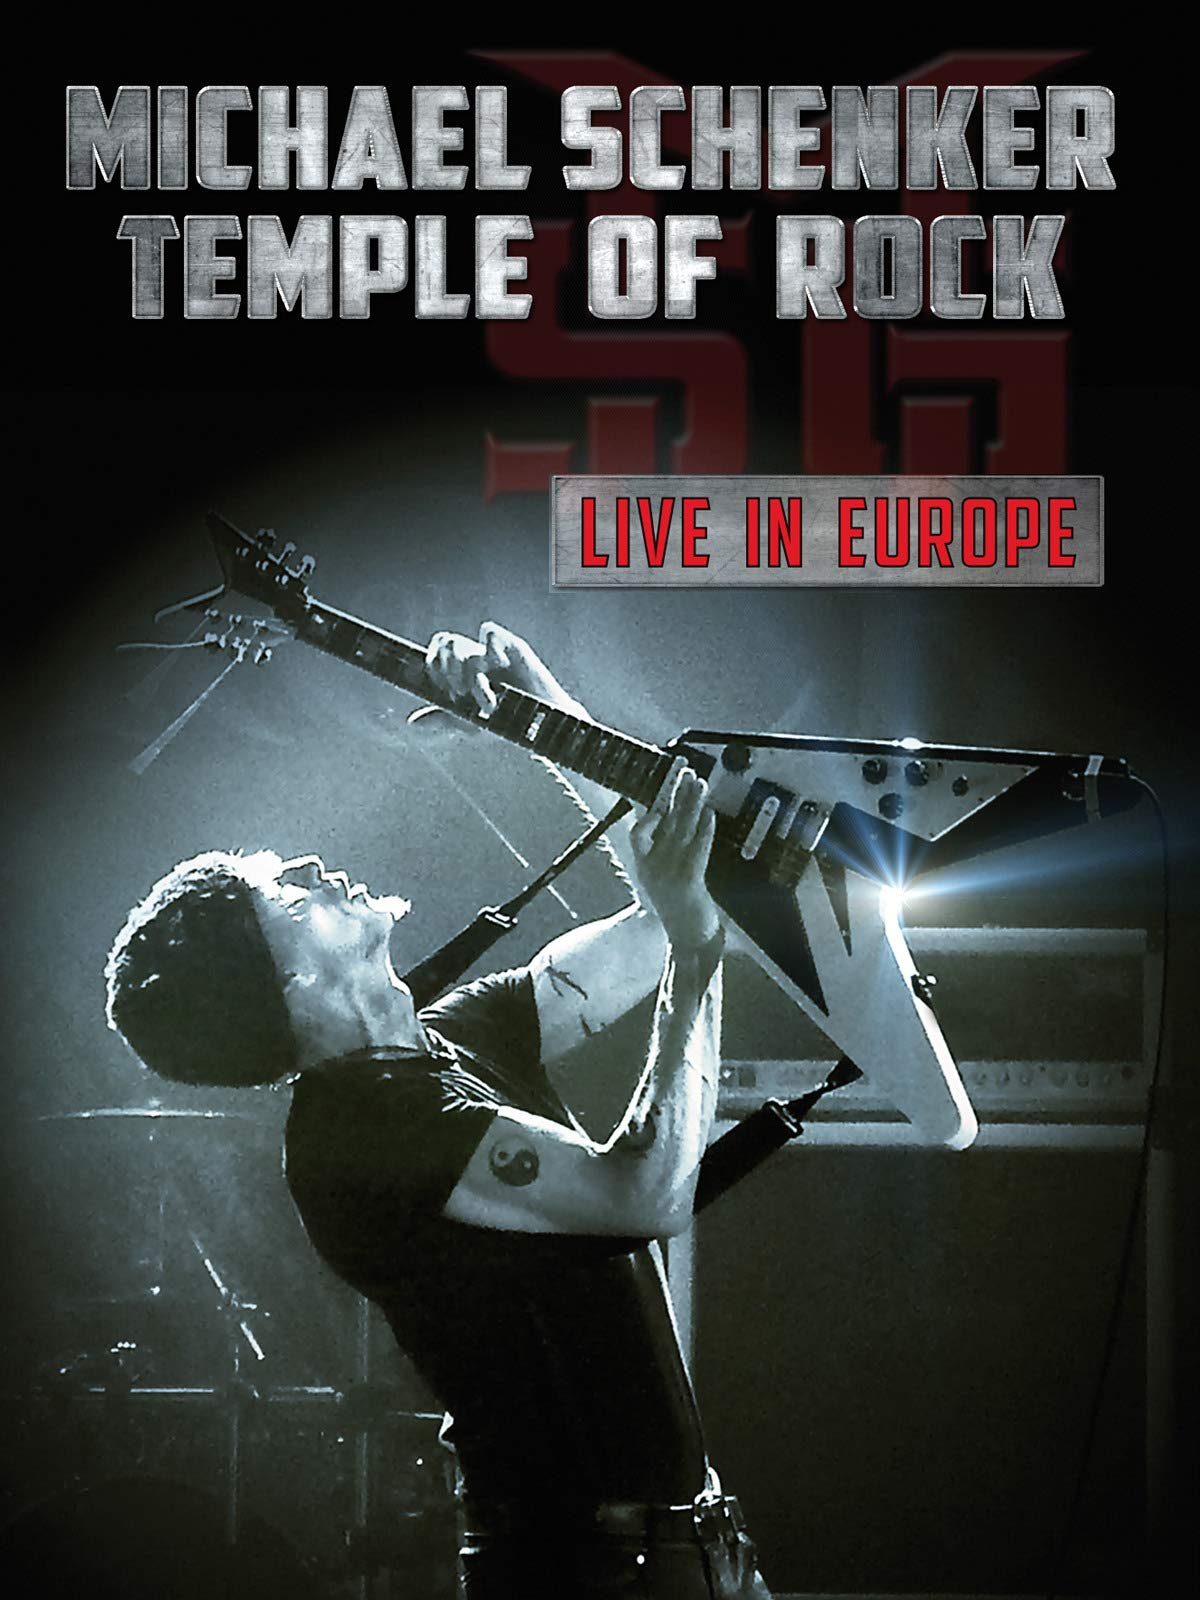 Watch Michael Schenker Temple Of Rock Live In Europe